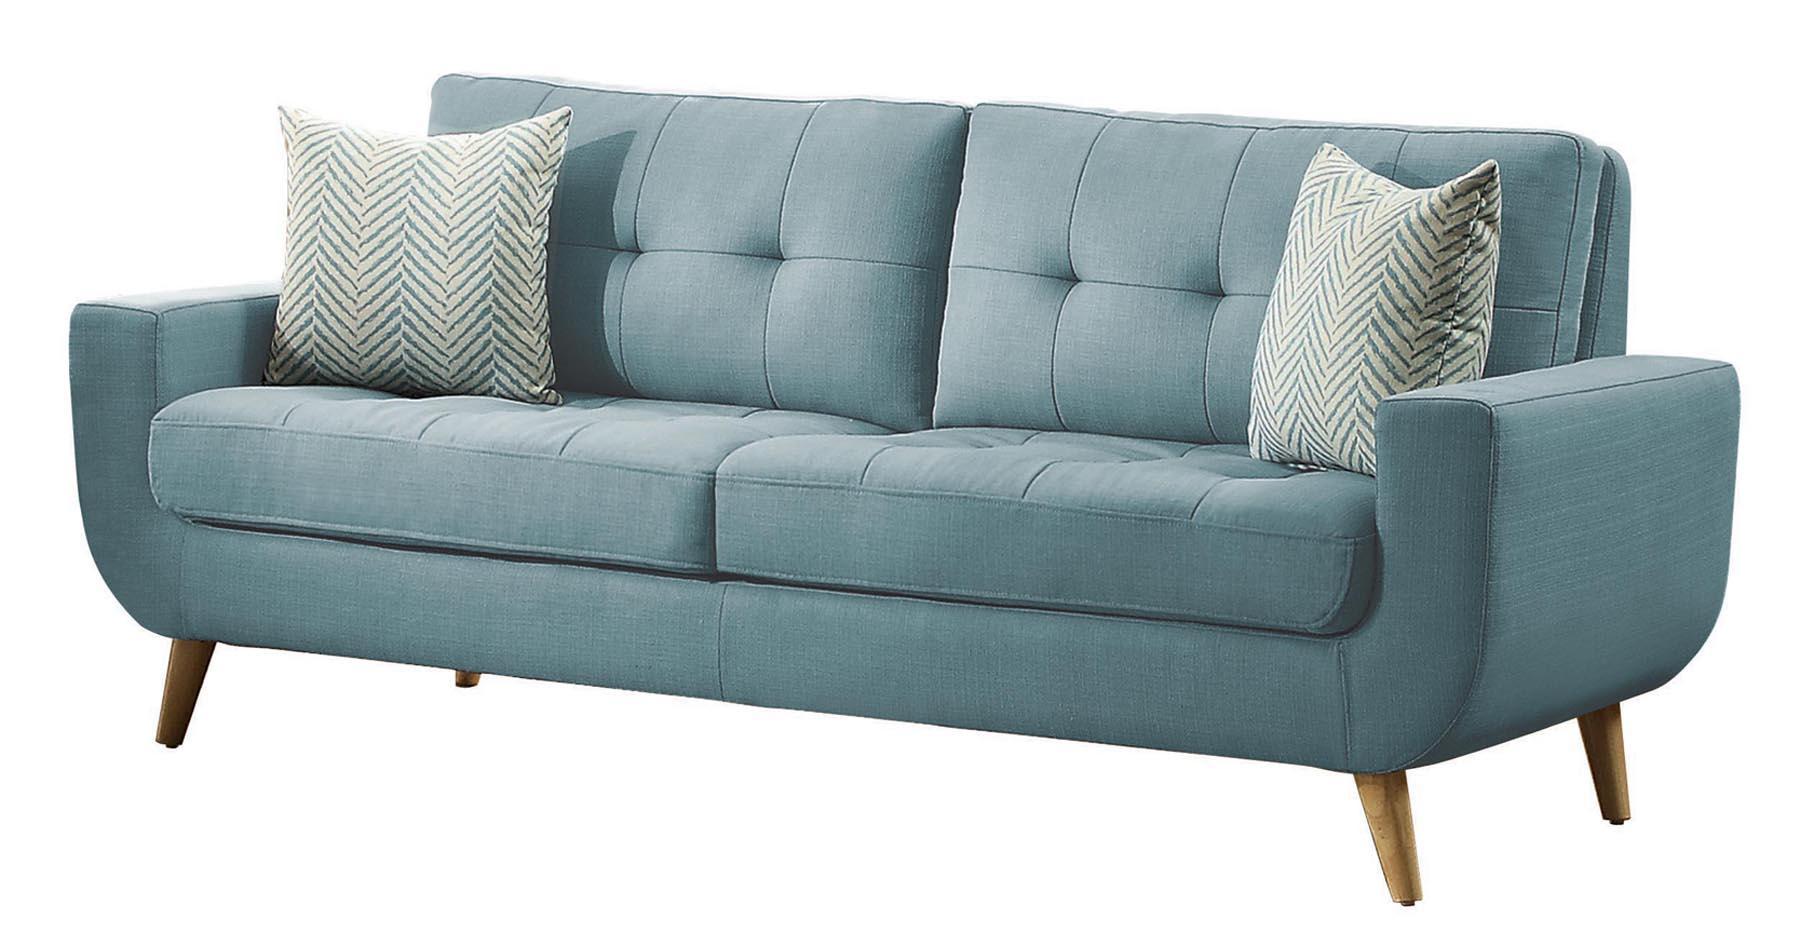 Homelegance deryn 86 sofa with tufted back for Pink sofa login